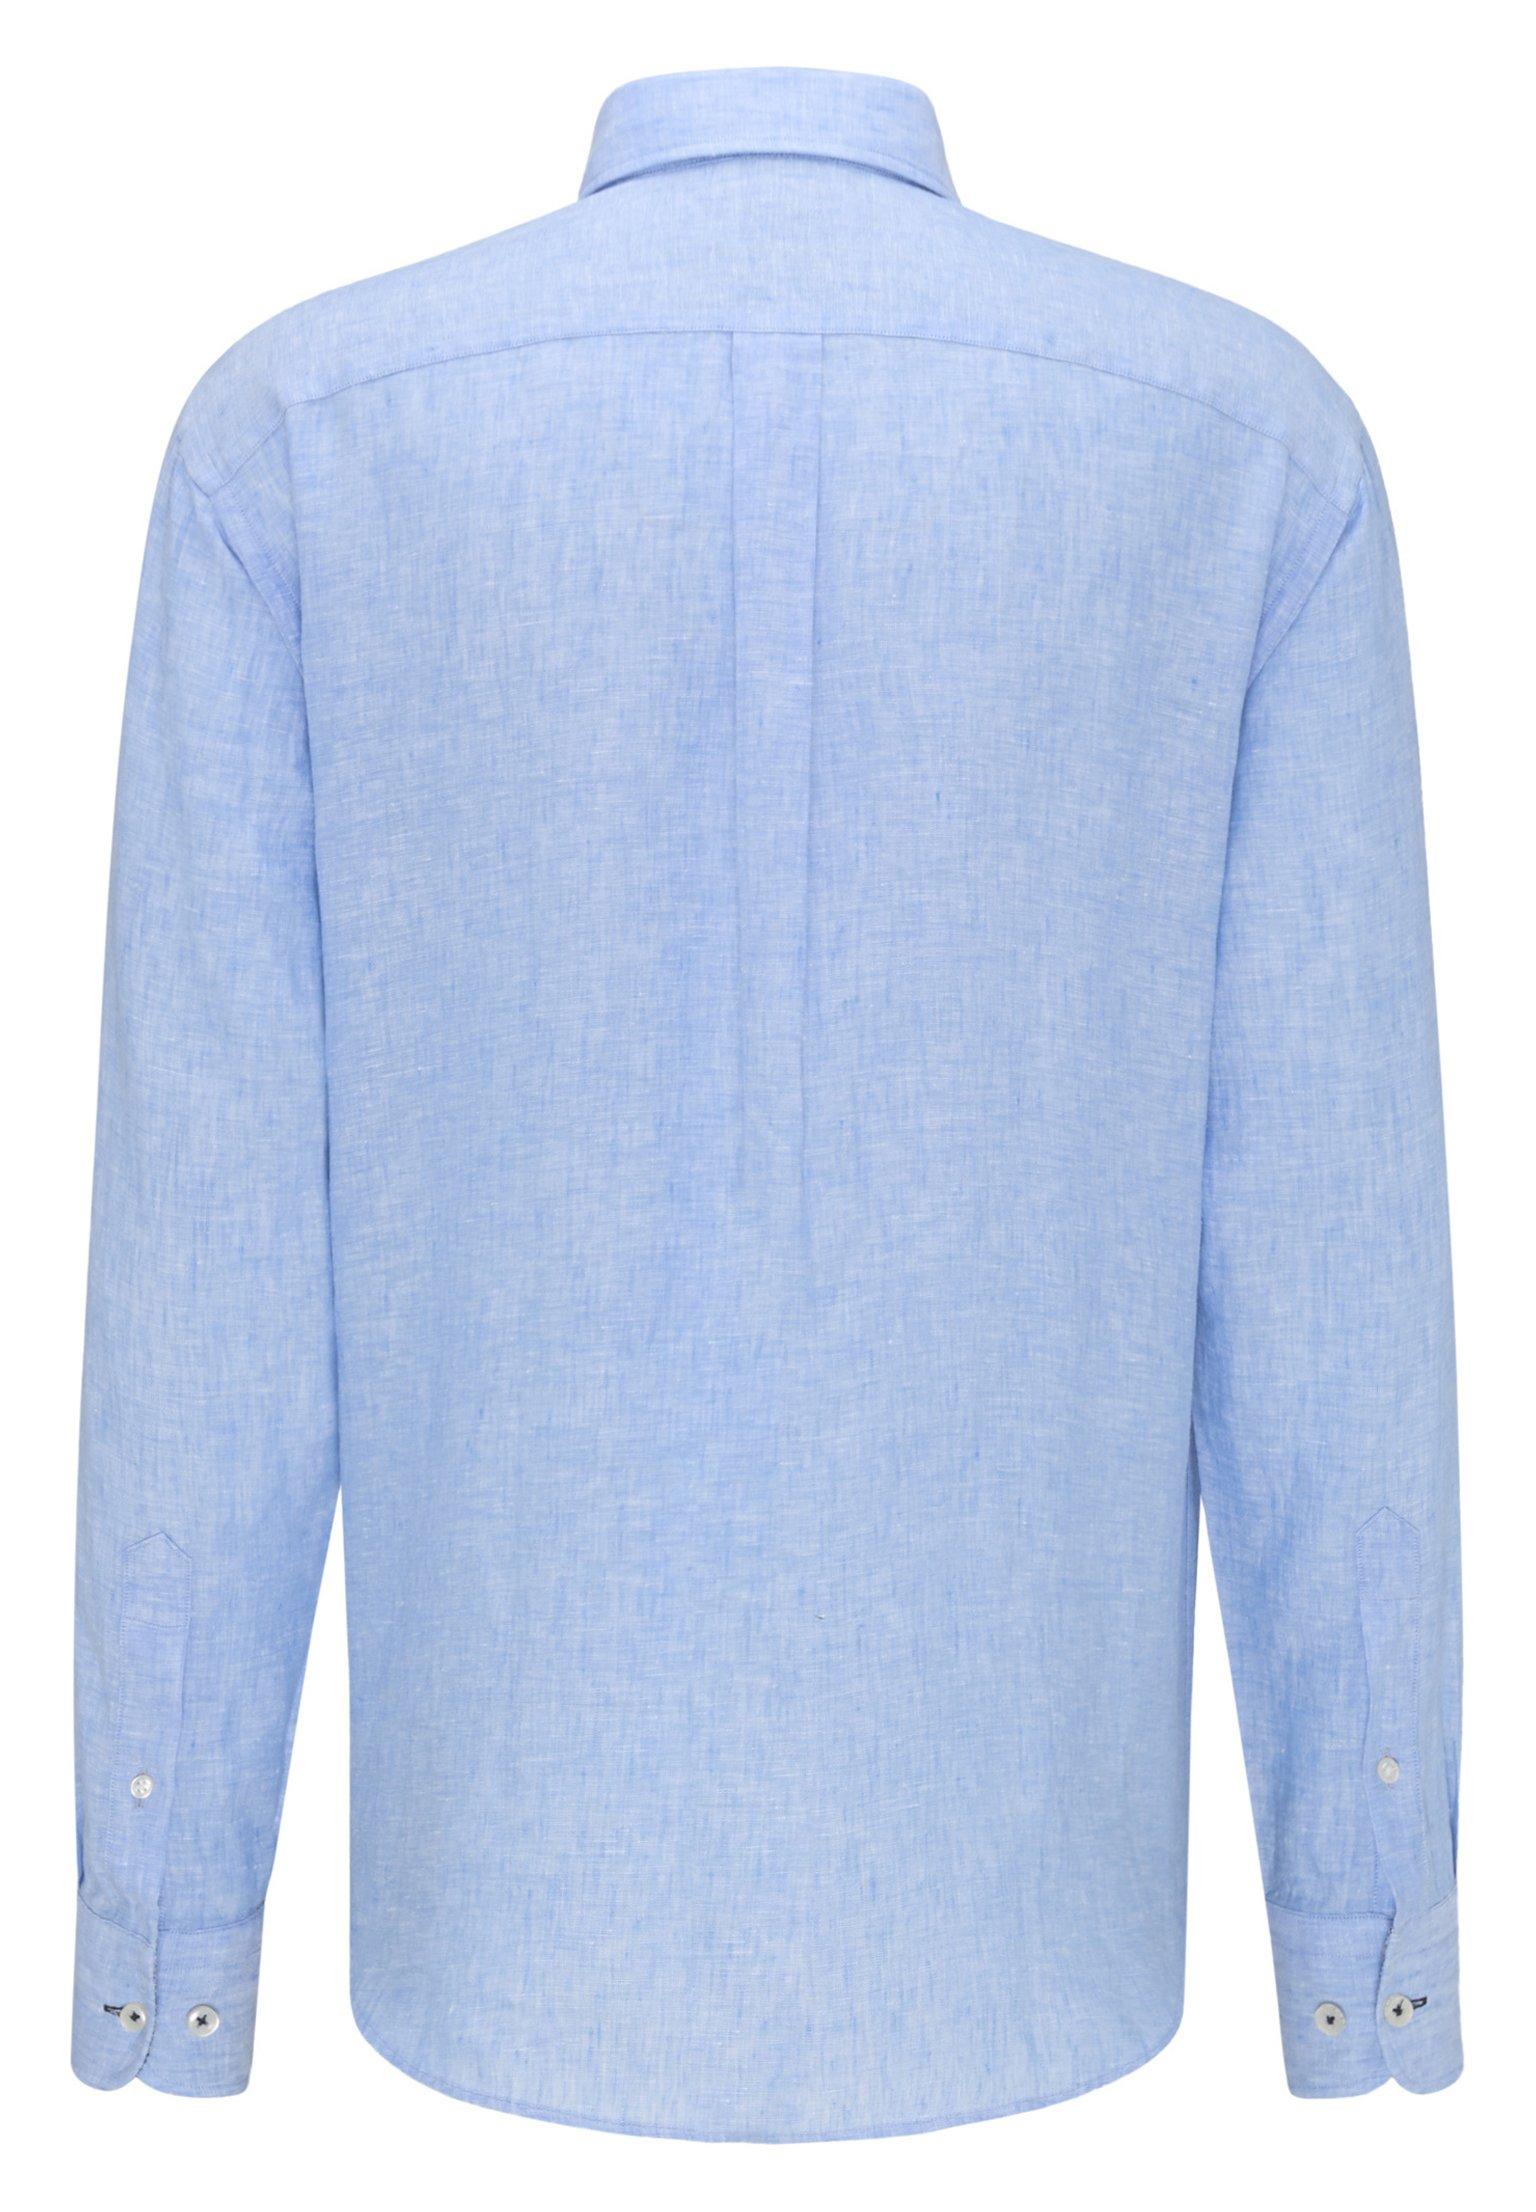 Fynch-Hatton Shirt - blue